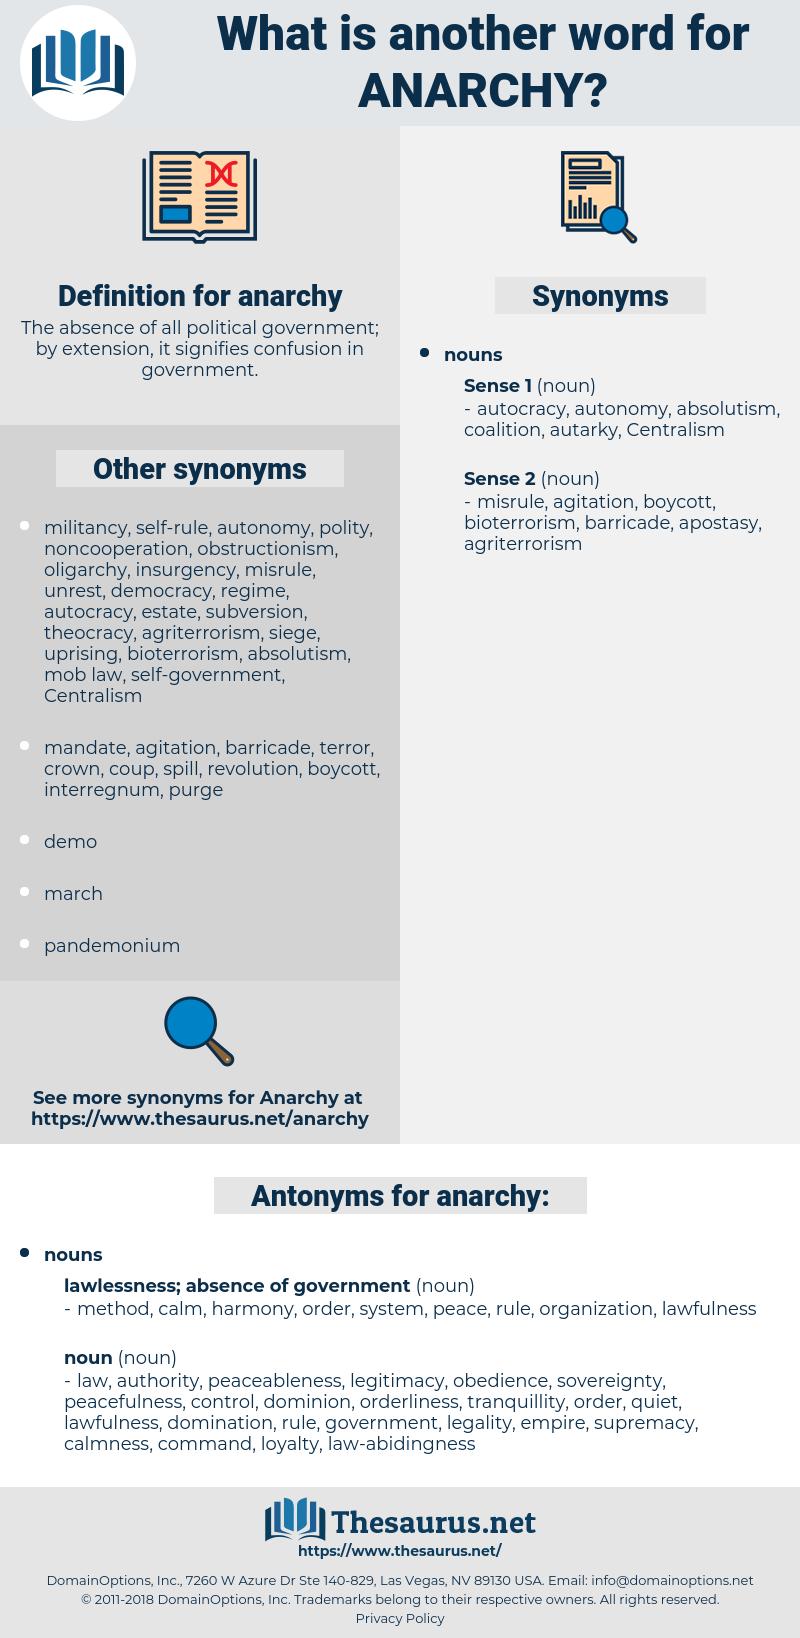 anarchy, synonym anarchy, another word for anarchy, words like anarchy, thesaurus anarchy